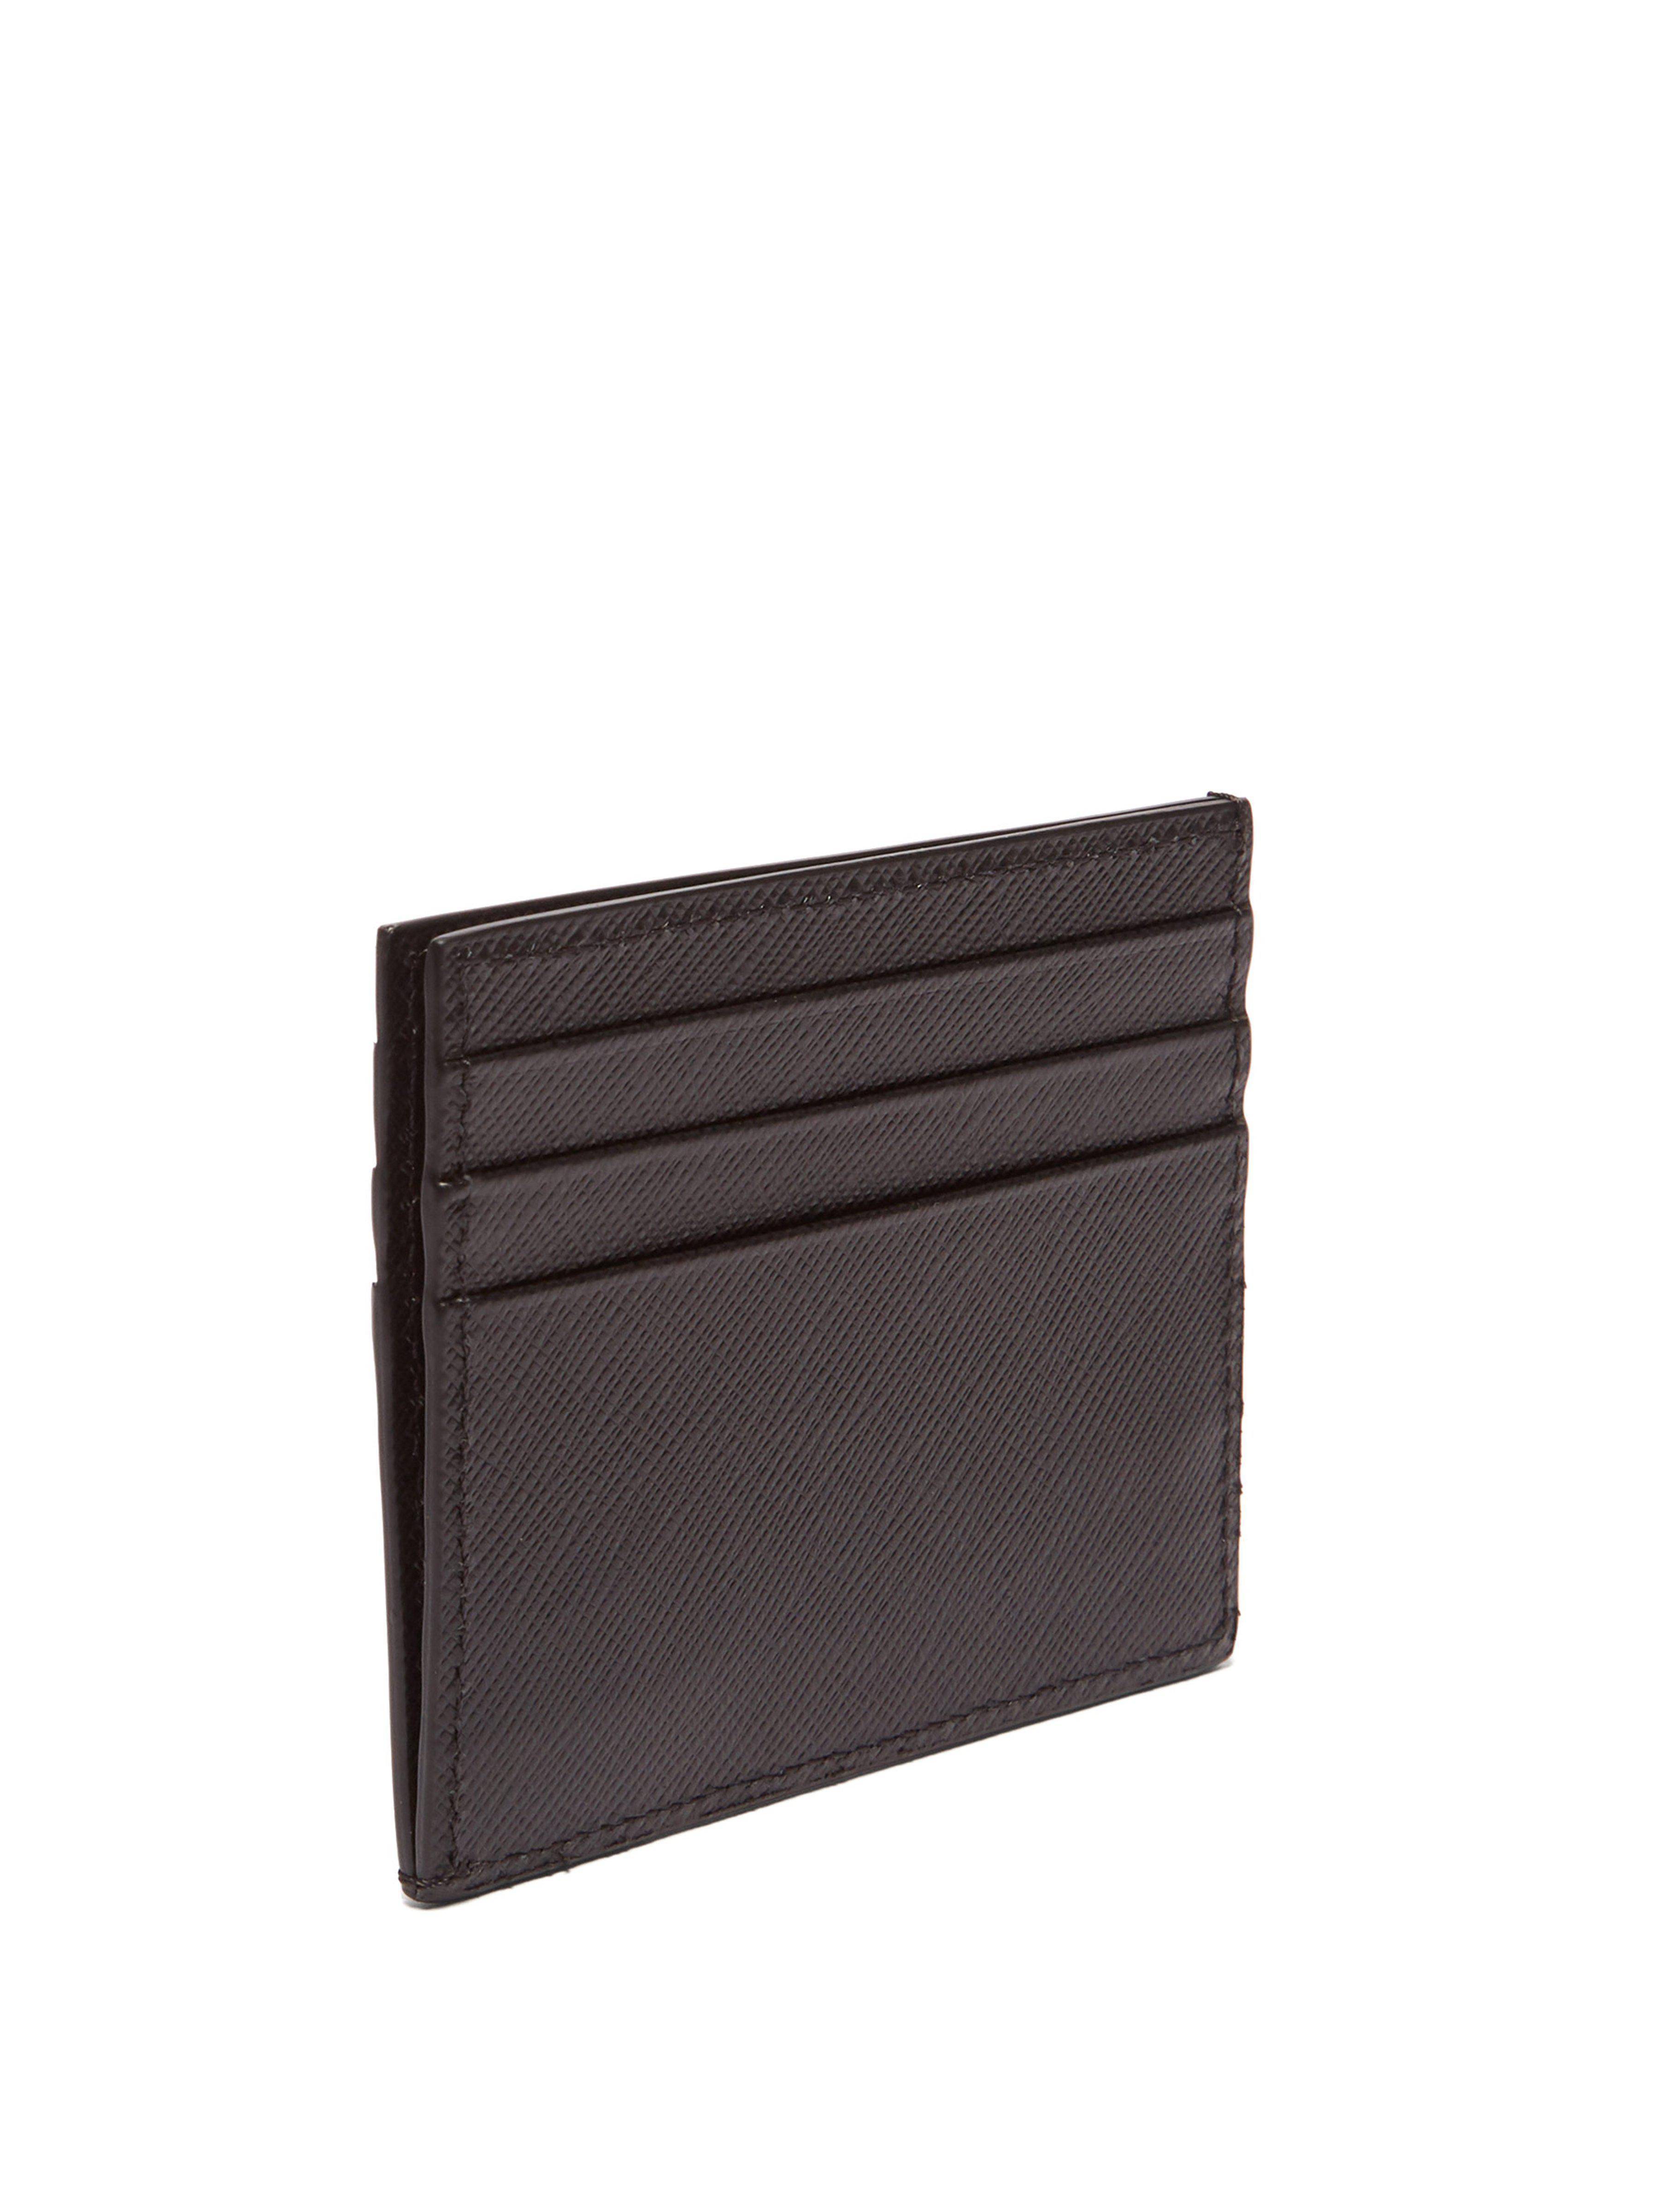 59fe96b046f Prada Saffiano Leather Metallic Embellished Cardholder in Black for Men -  Save 11% - Lyst